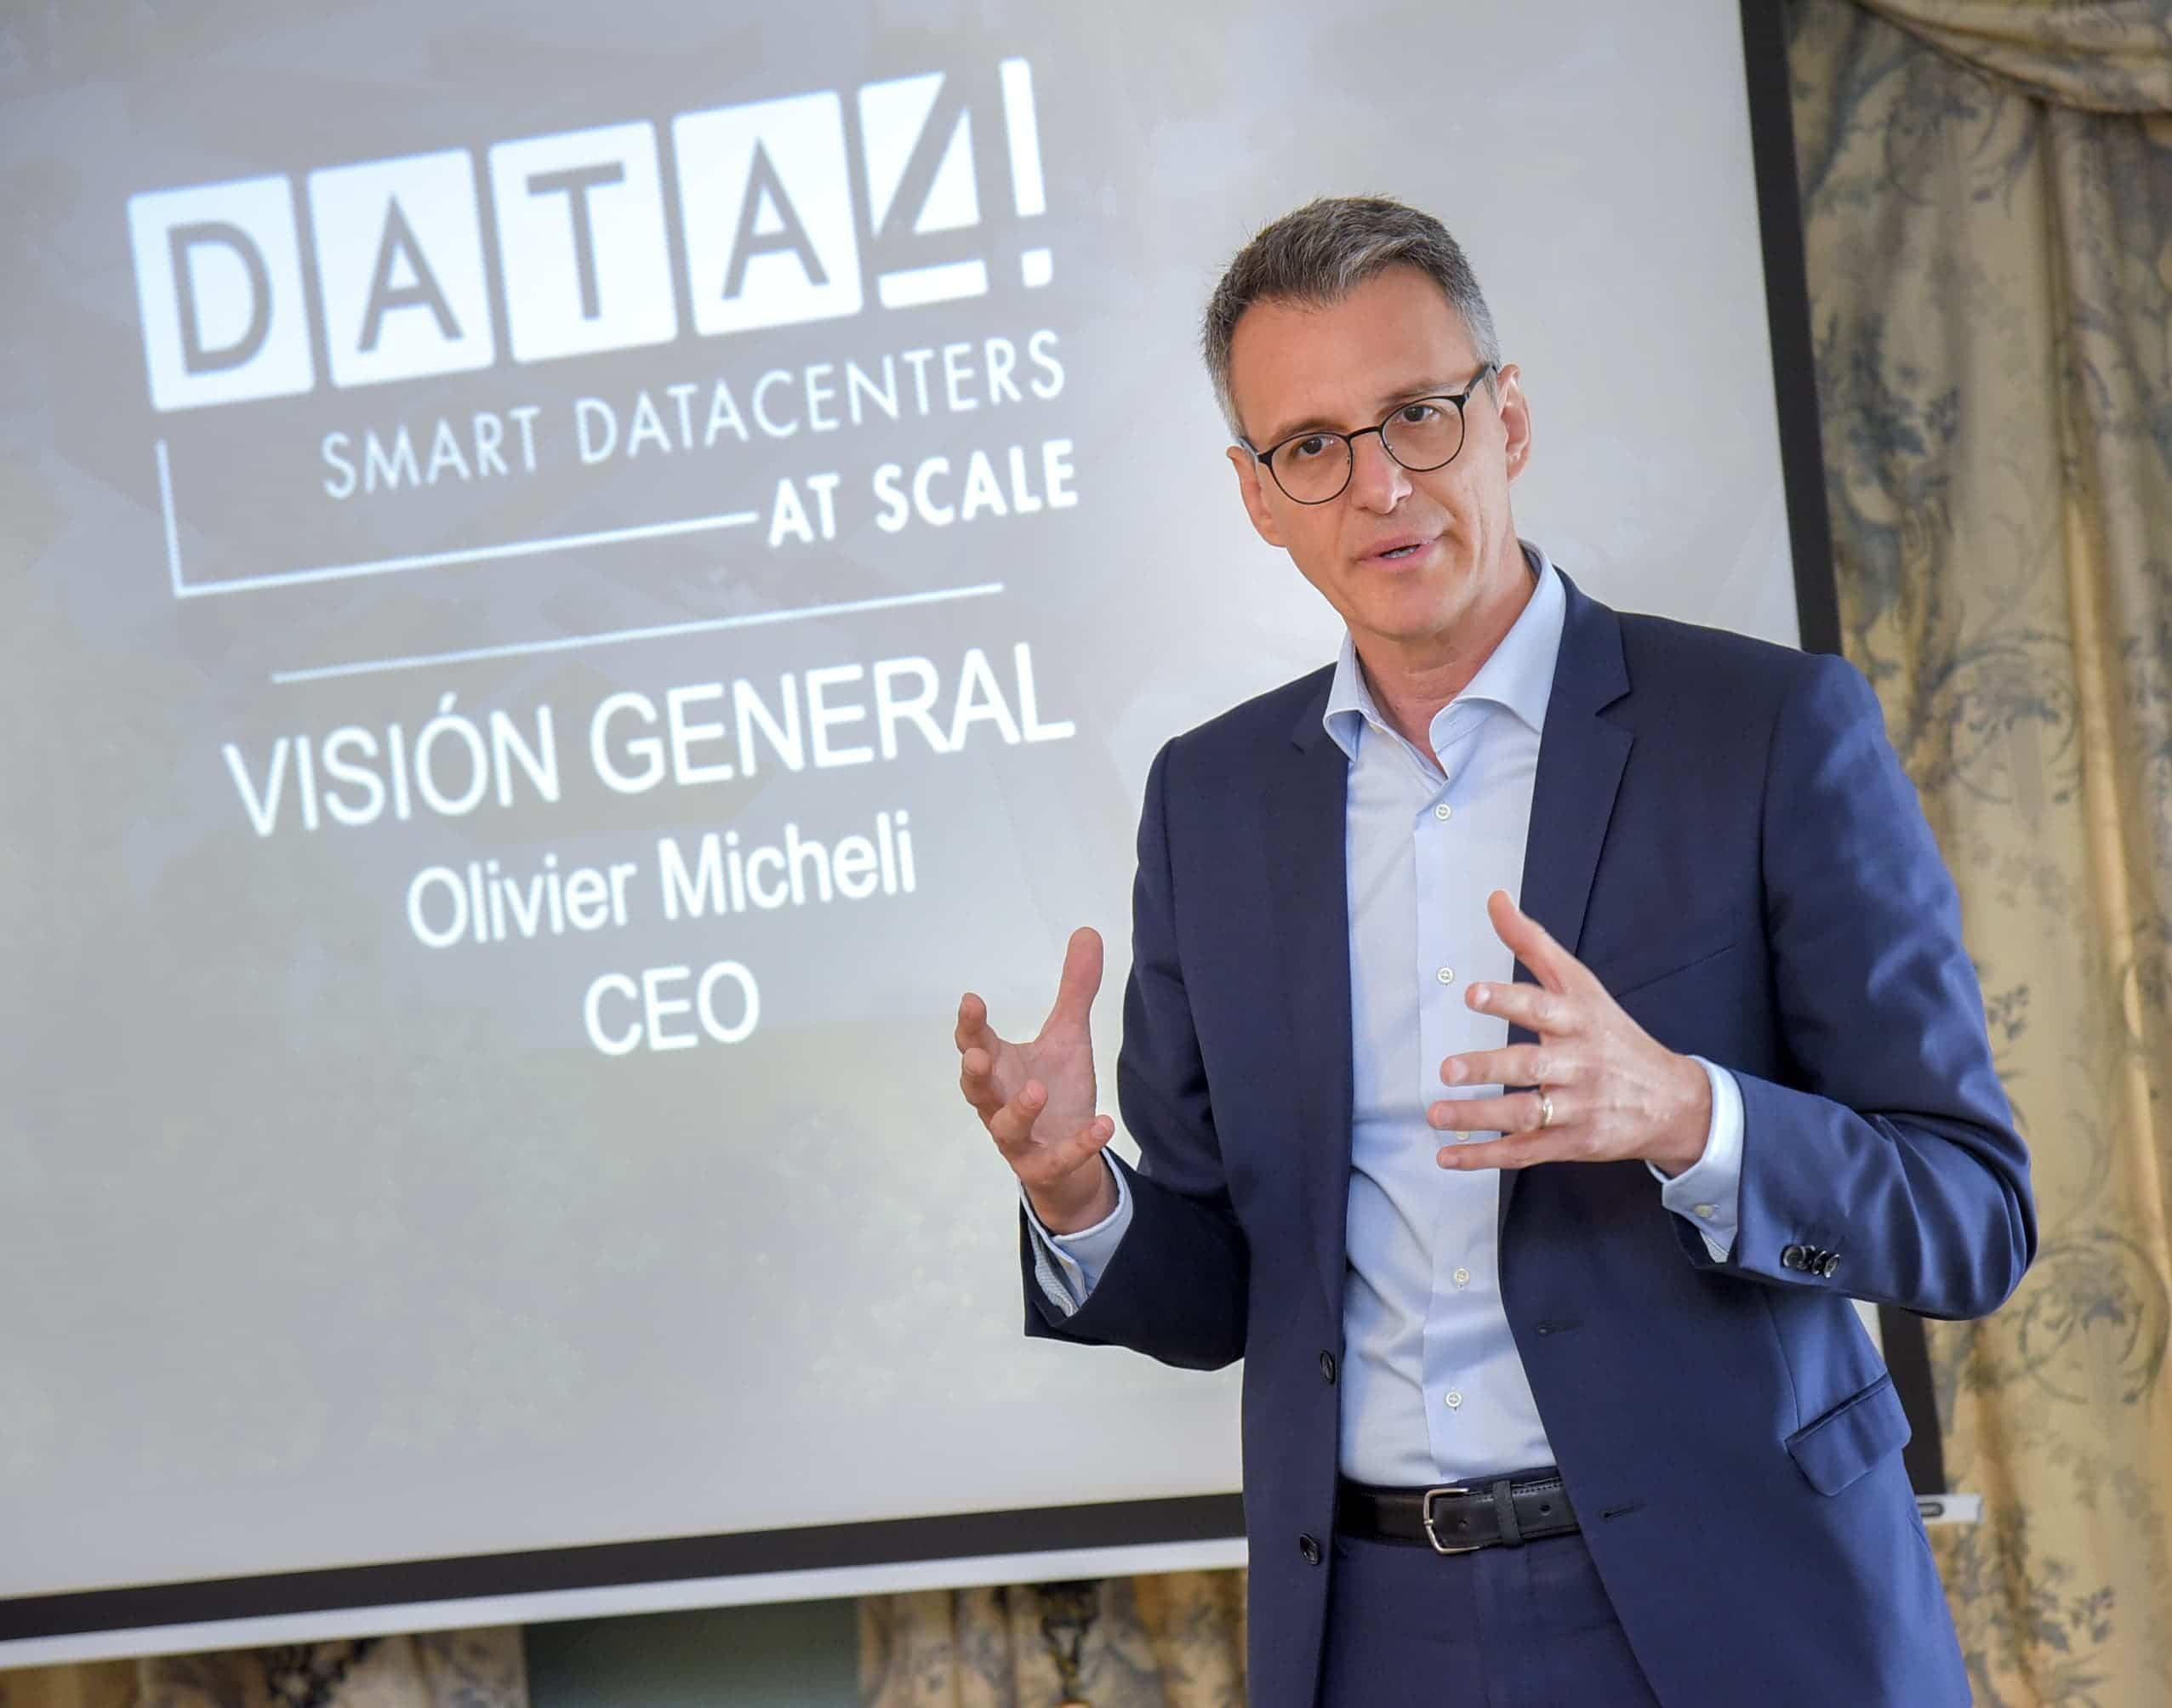 presentacion datacenter data4